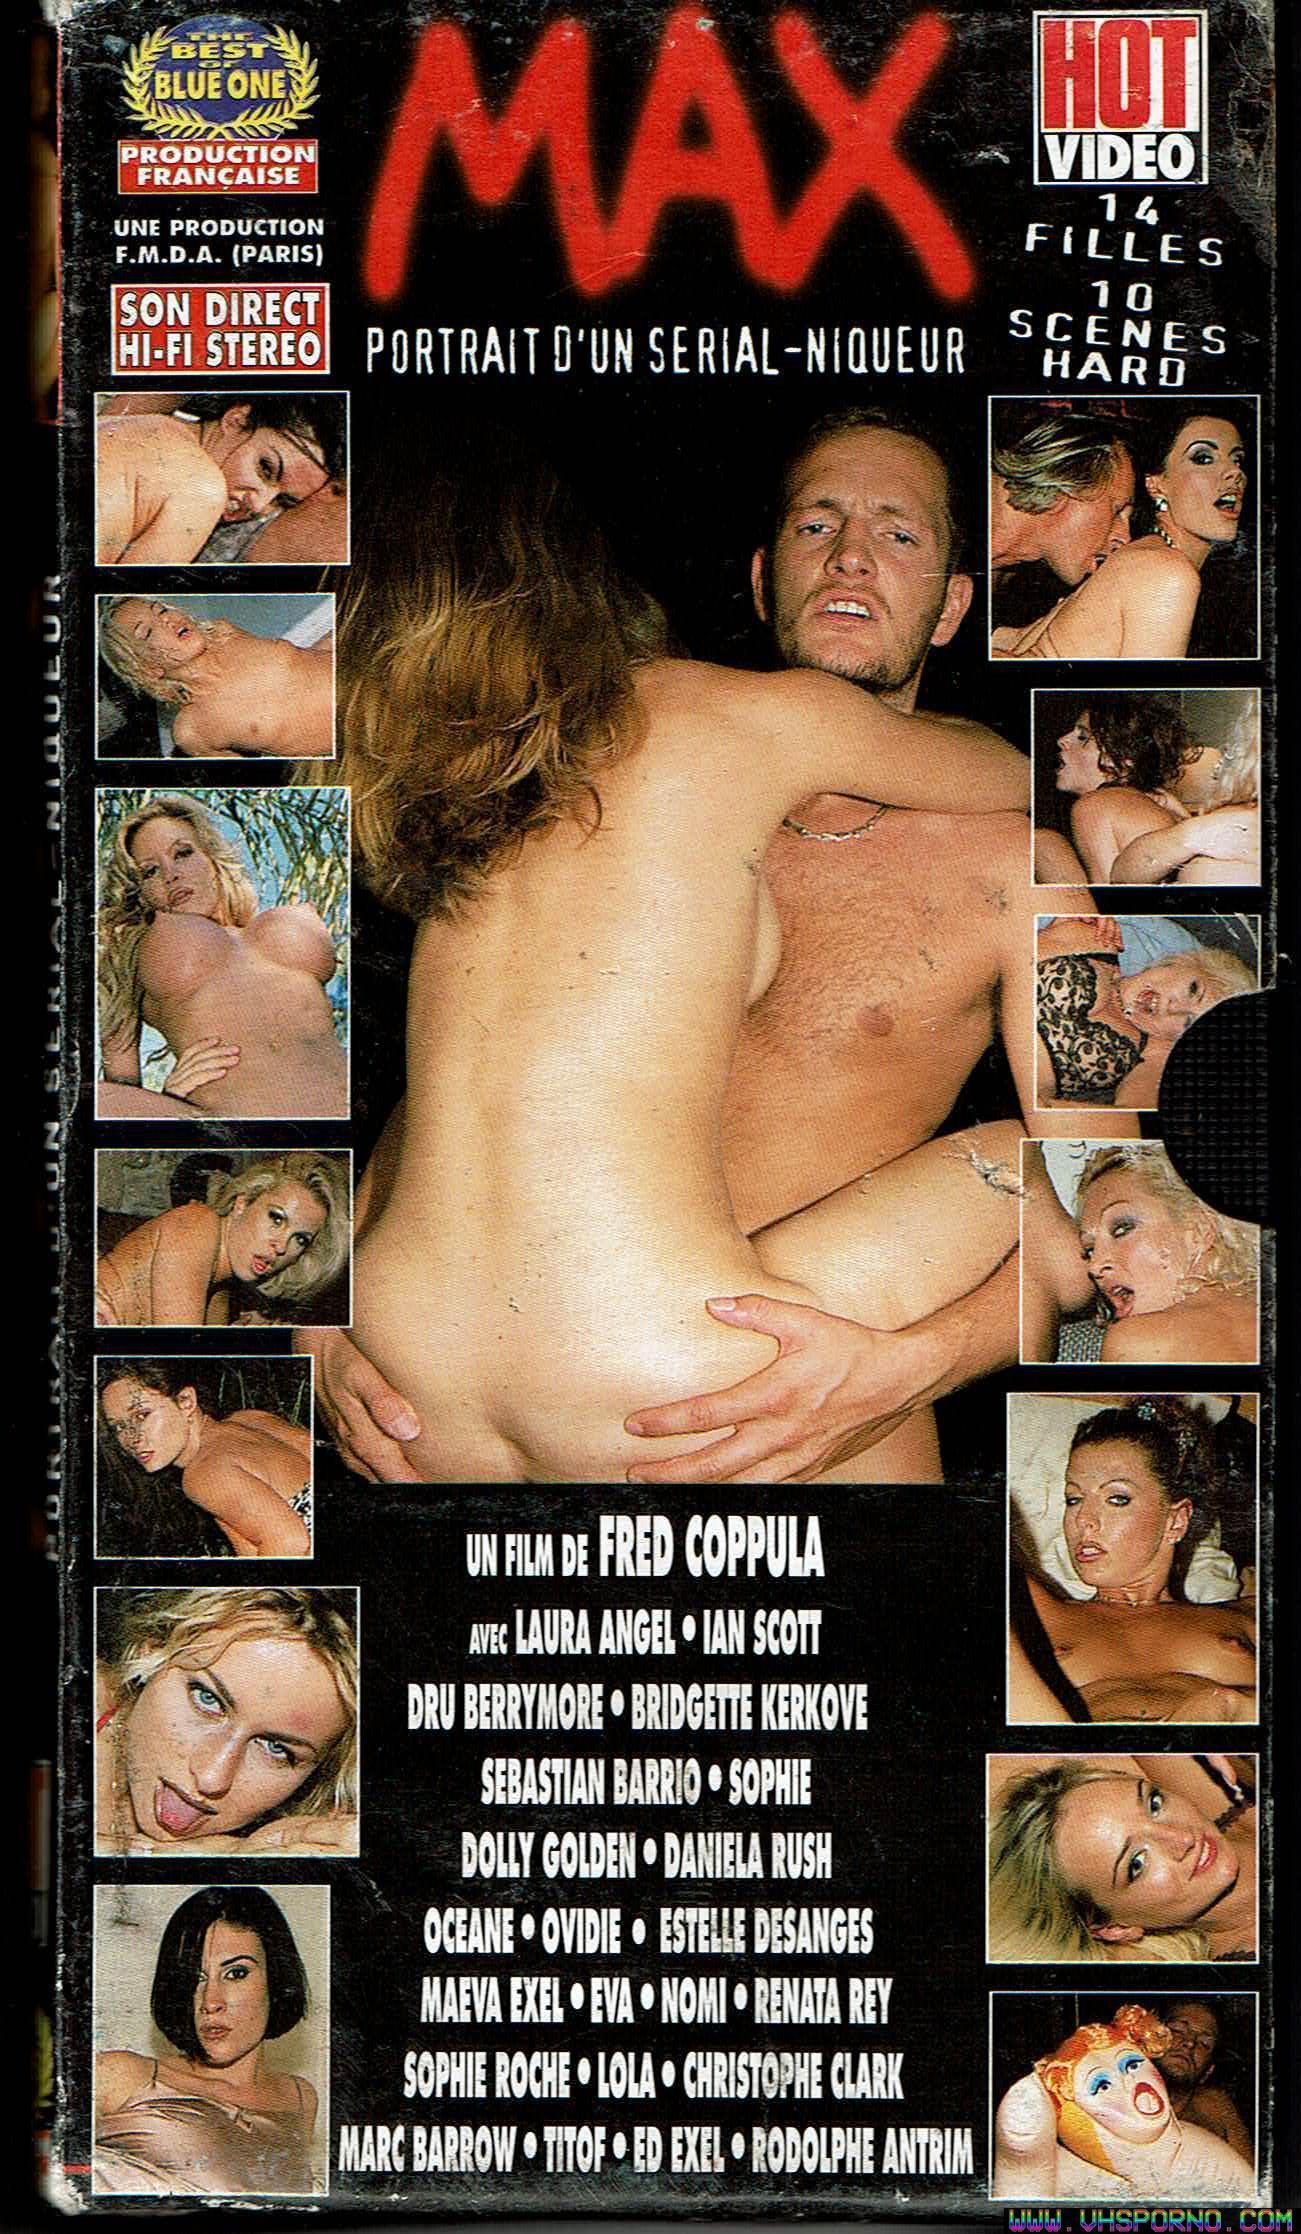 Pochette de Max, portrait d'un serial-niqueur un film de Fred Coppula • VHS Porno